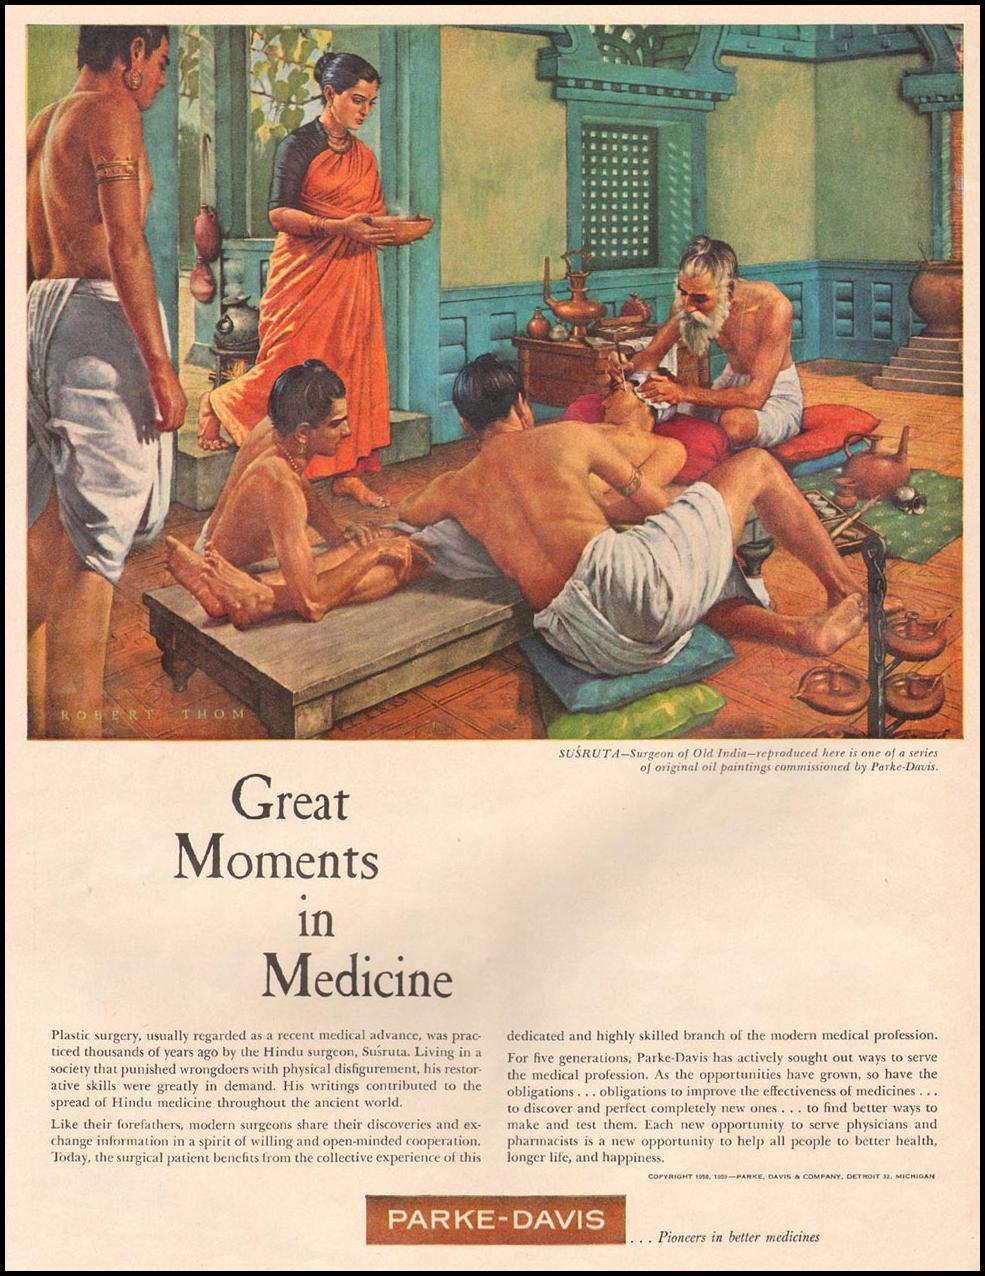 PHARMACEUTICALS LIFE 08/10/1959